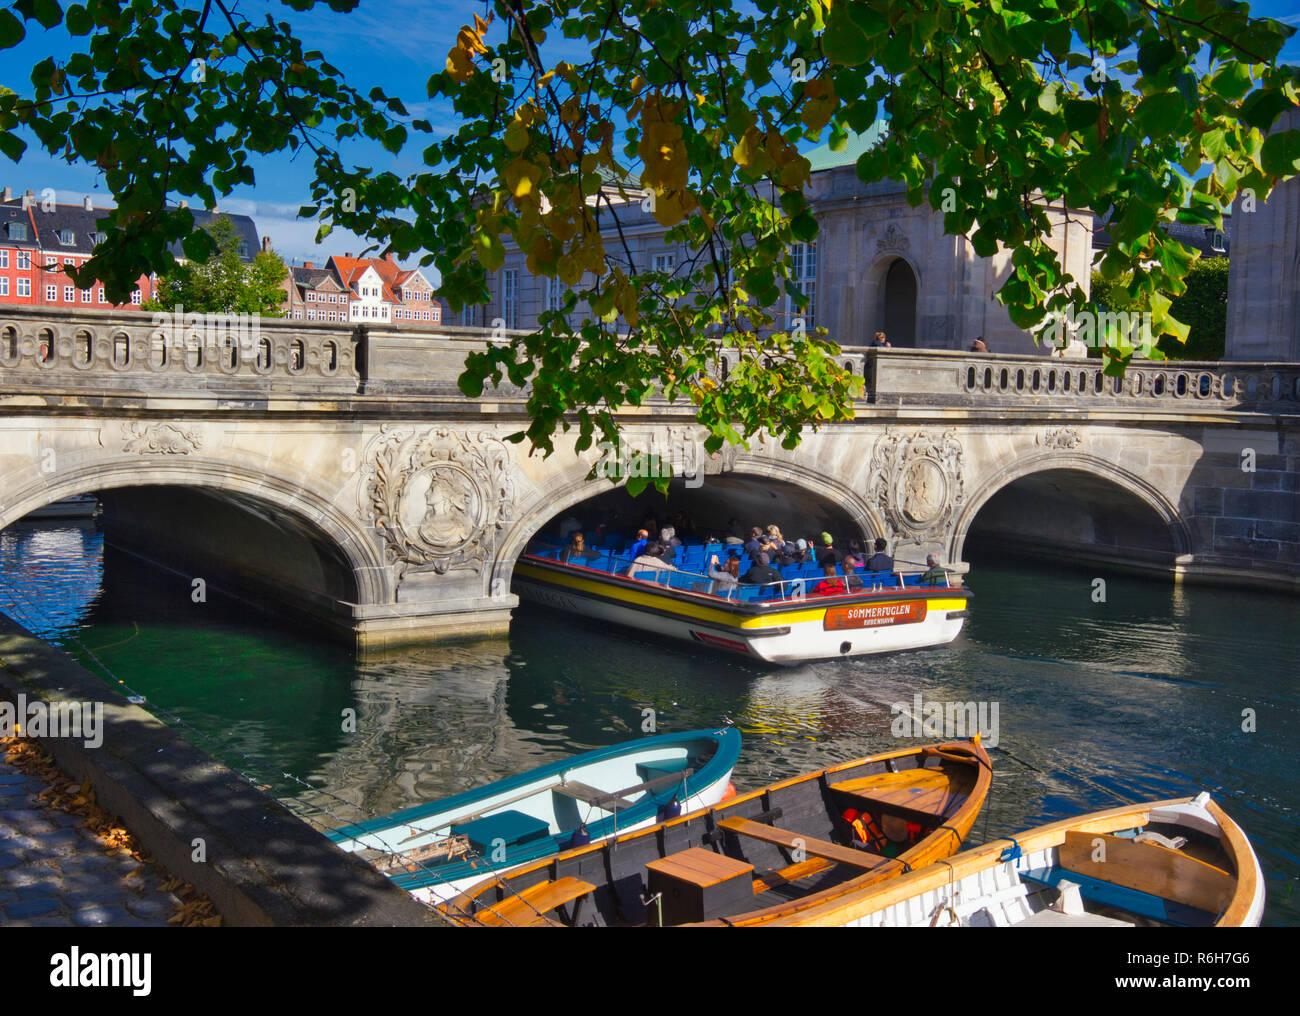 Tourist sightseeing boat passing under the Marble Bridge (Marmorbroen), Copenhagen, Denmark, Scandinavia - Stock Image